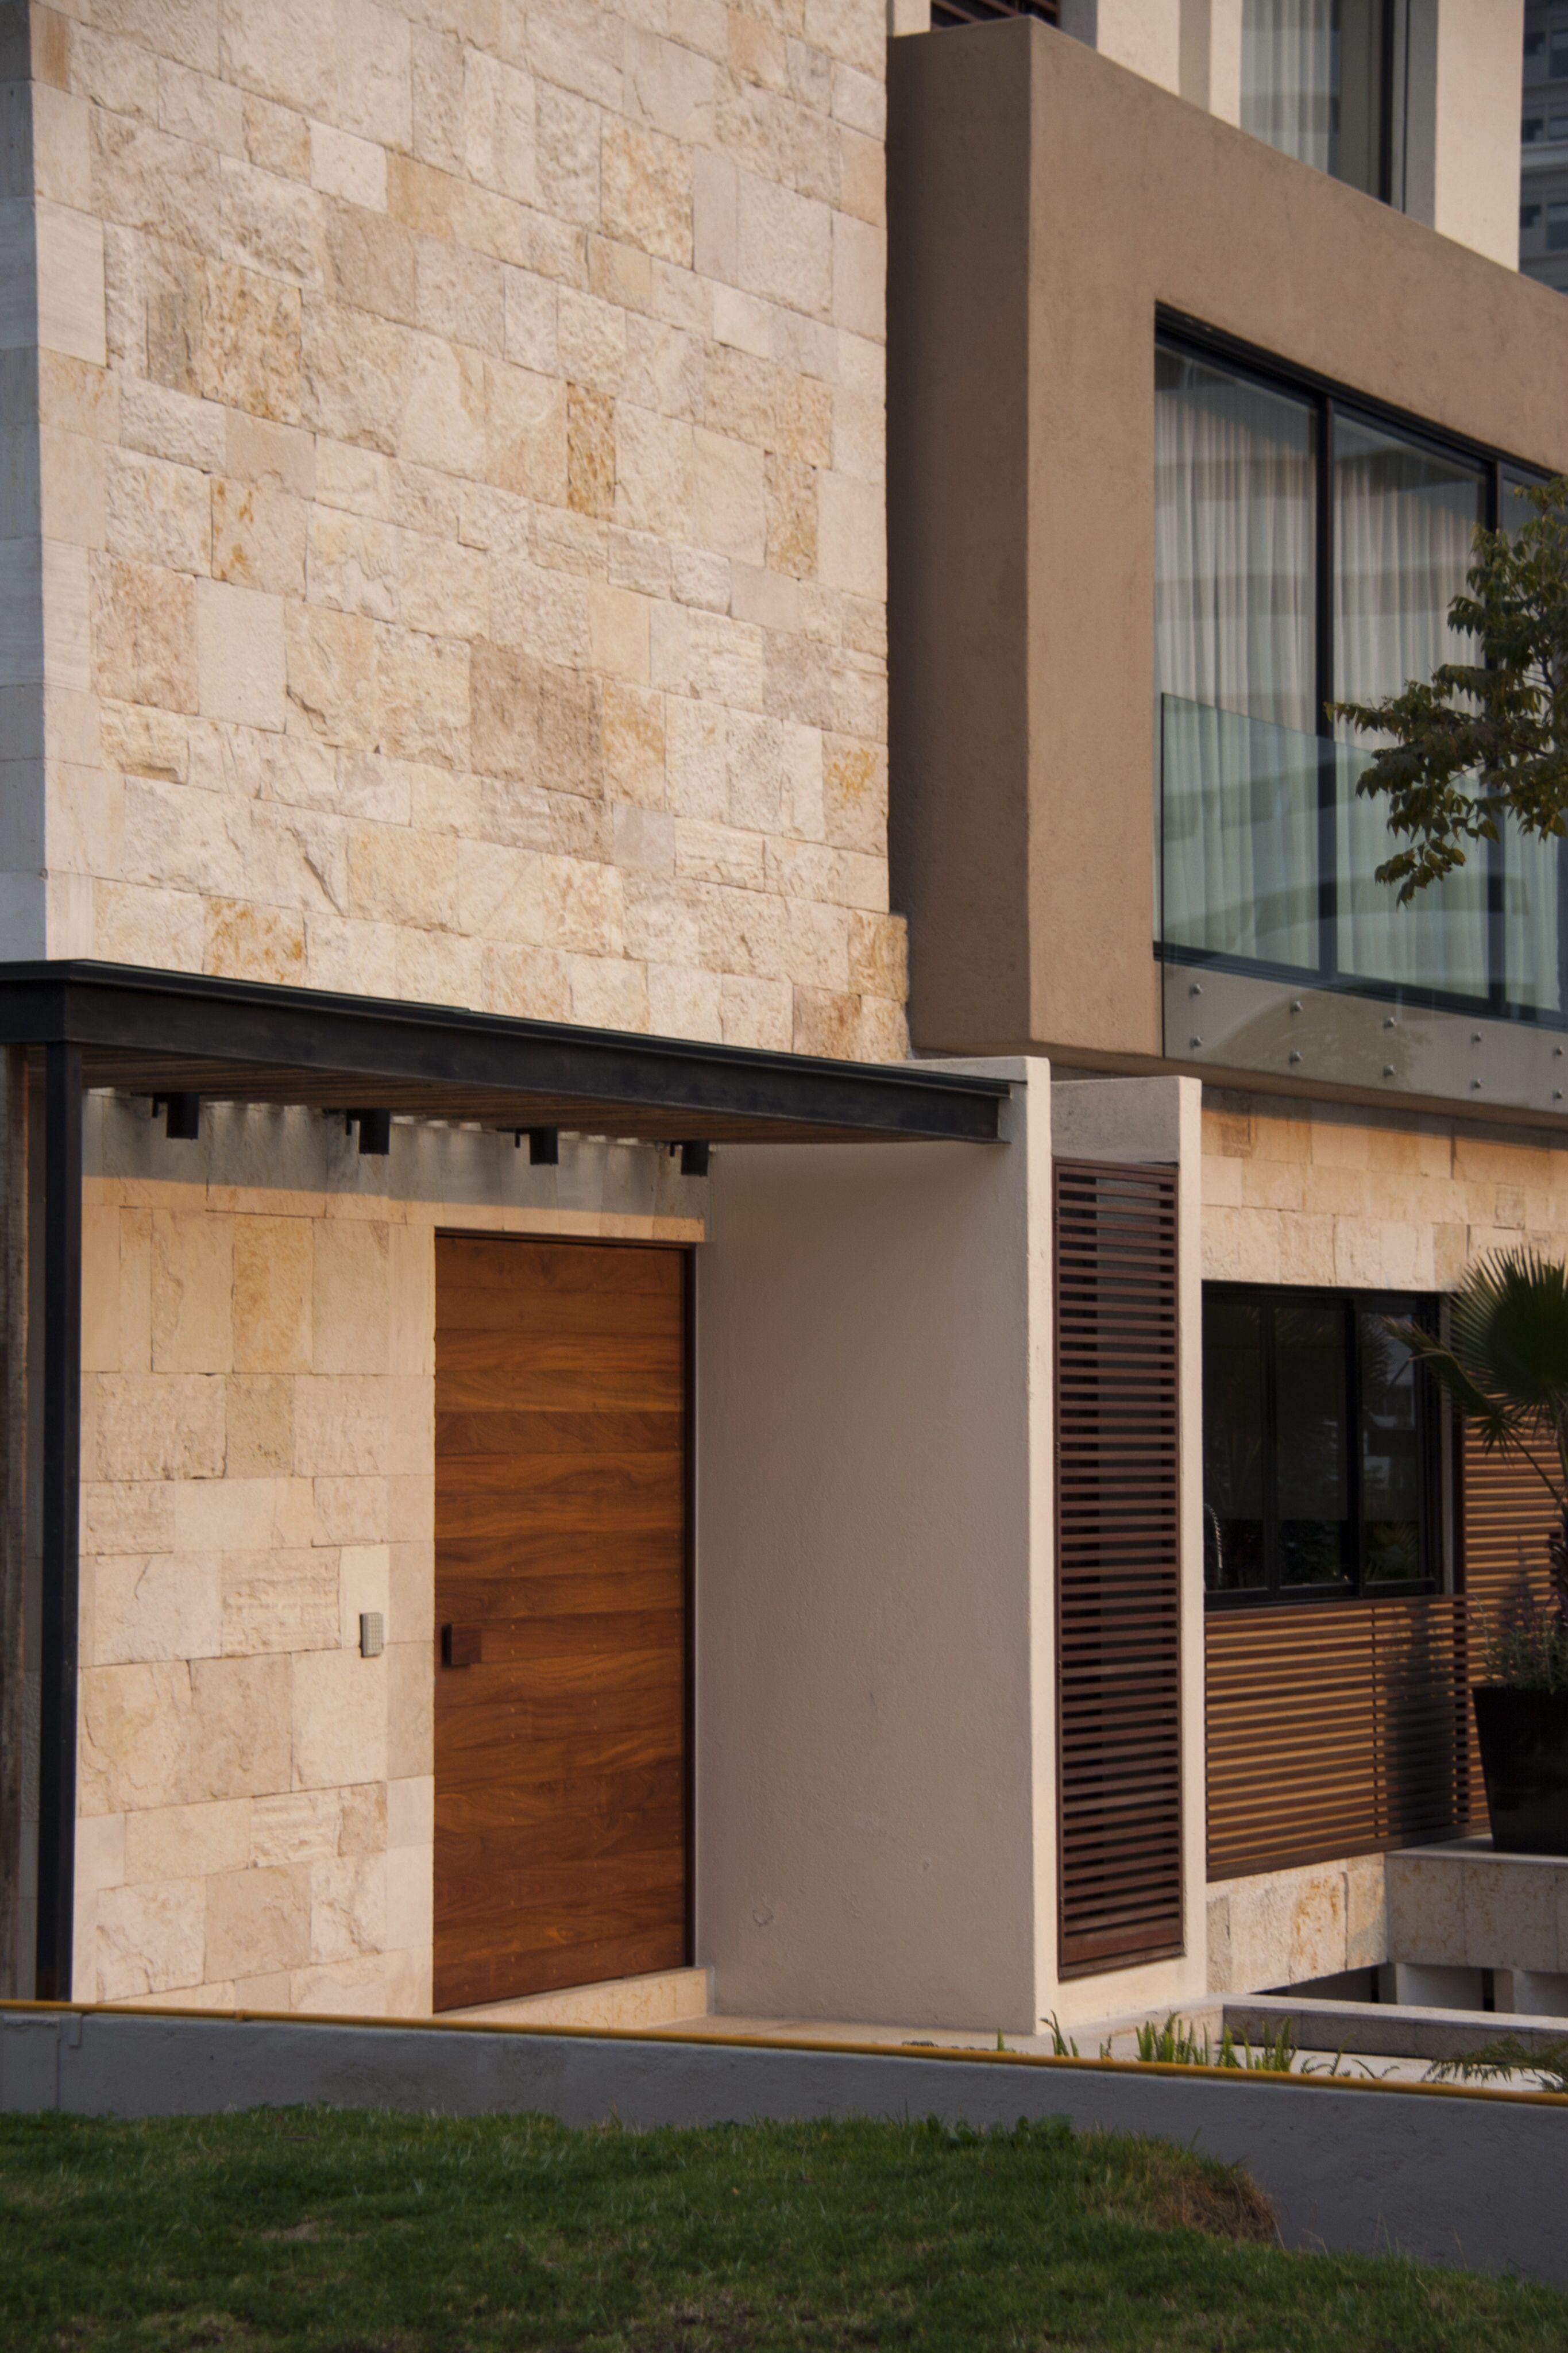 Casa ss fachada muros de piedra puerta de madera for Losetas para fachadas